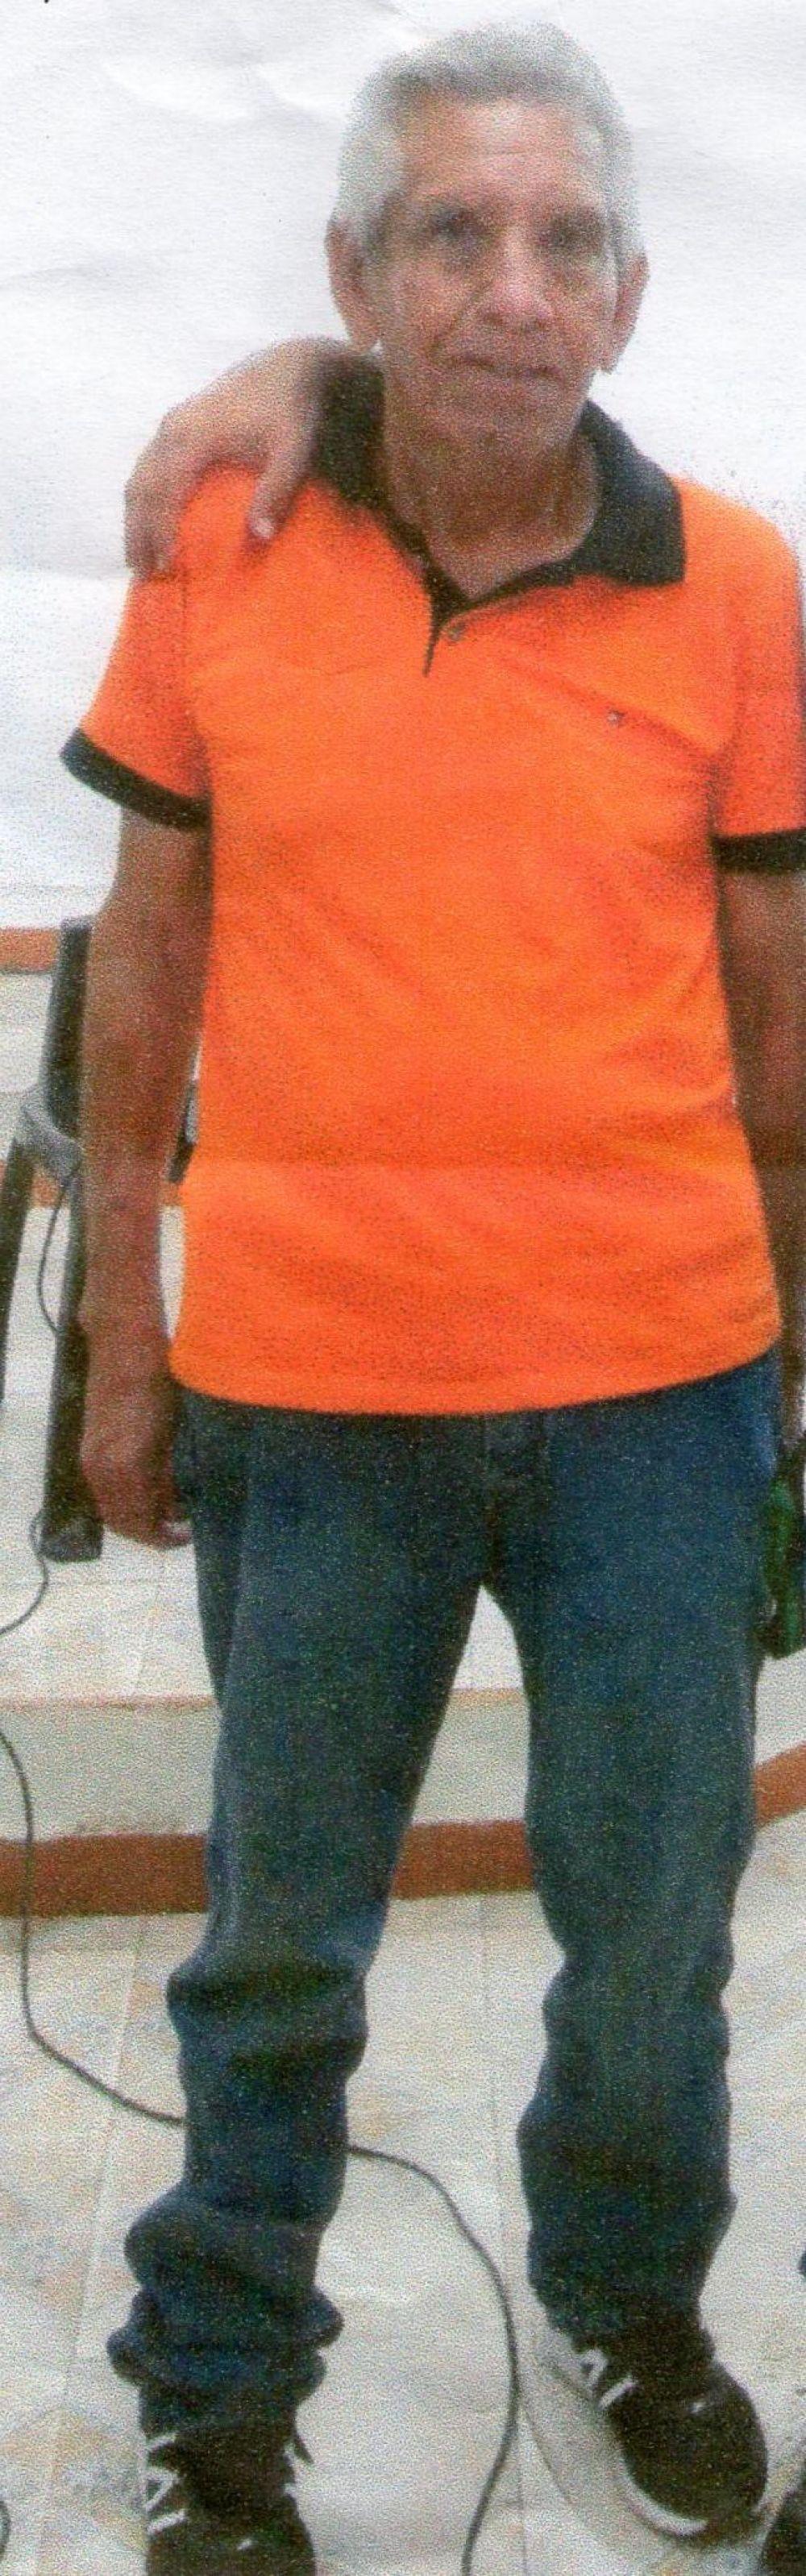 foto: Buscan a anciano con Alzheimer que se fue de su casa ayer